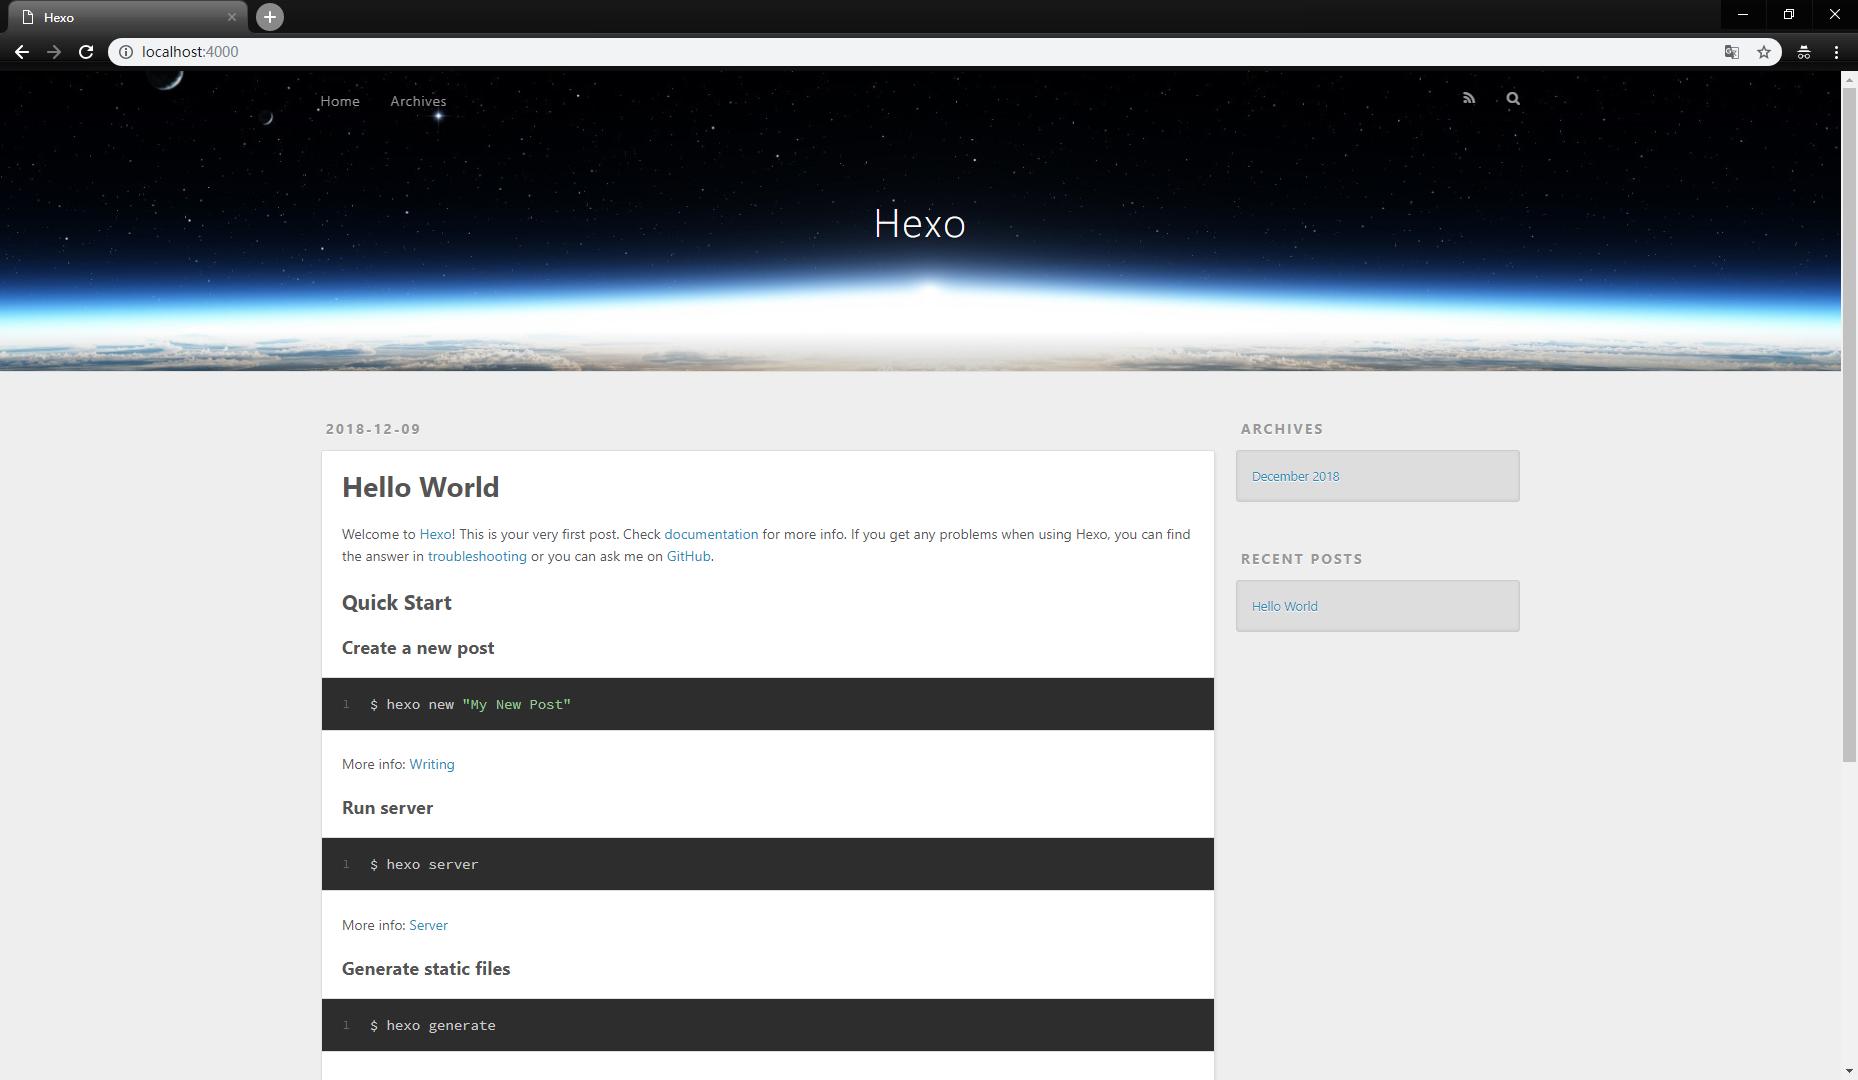 hexo 博客的初始页面